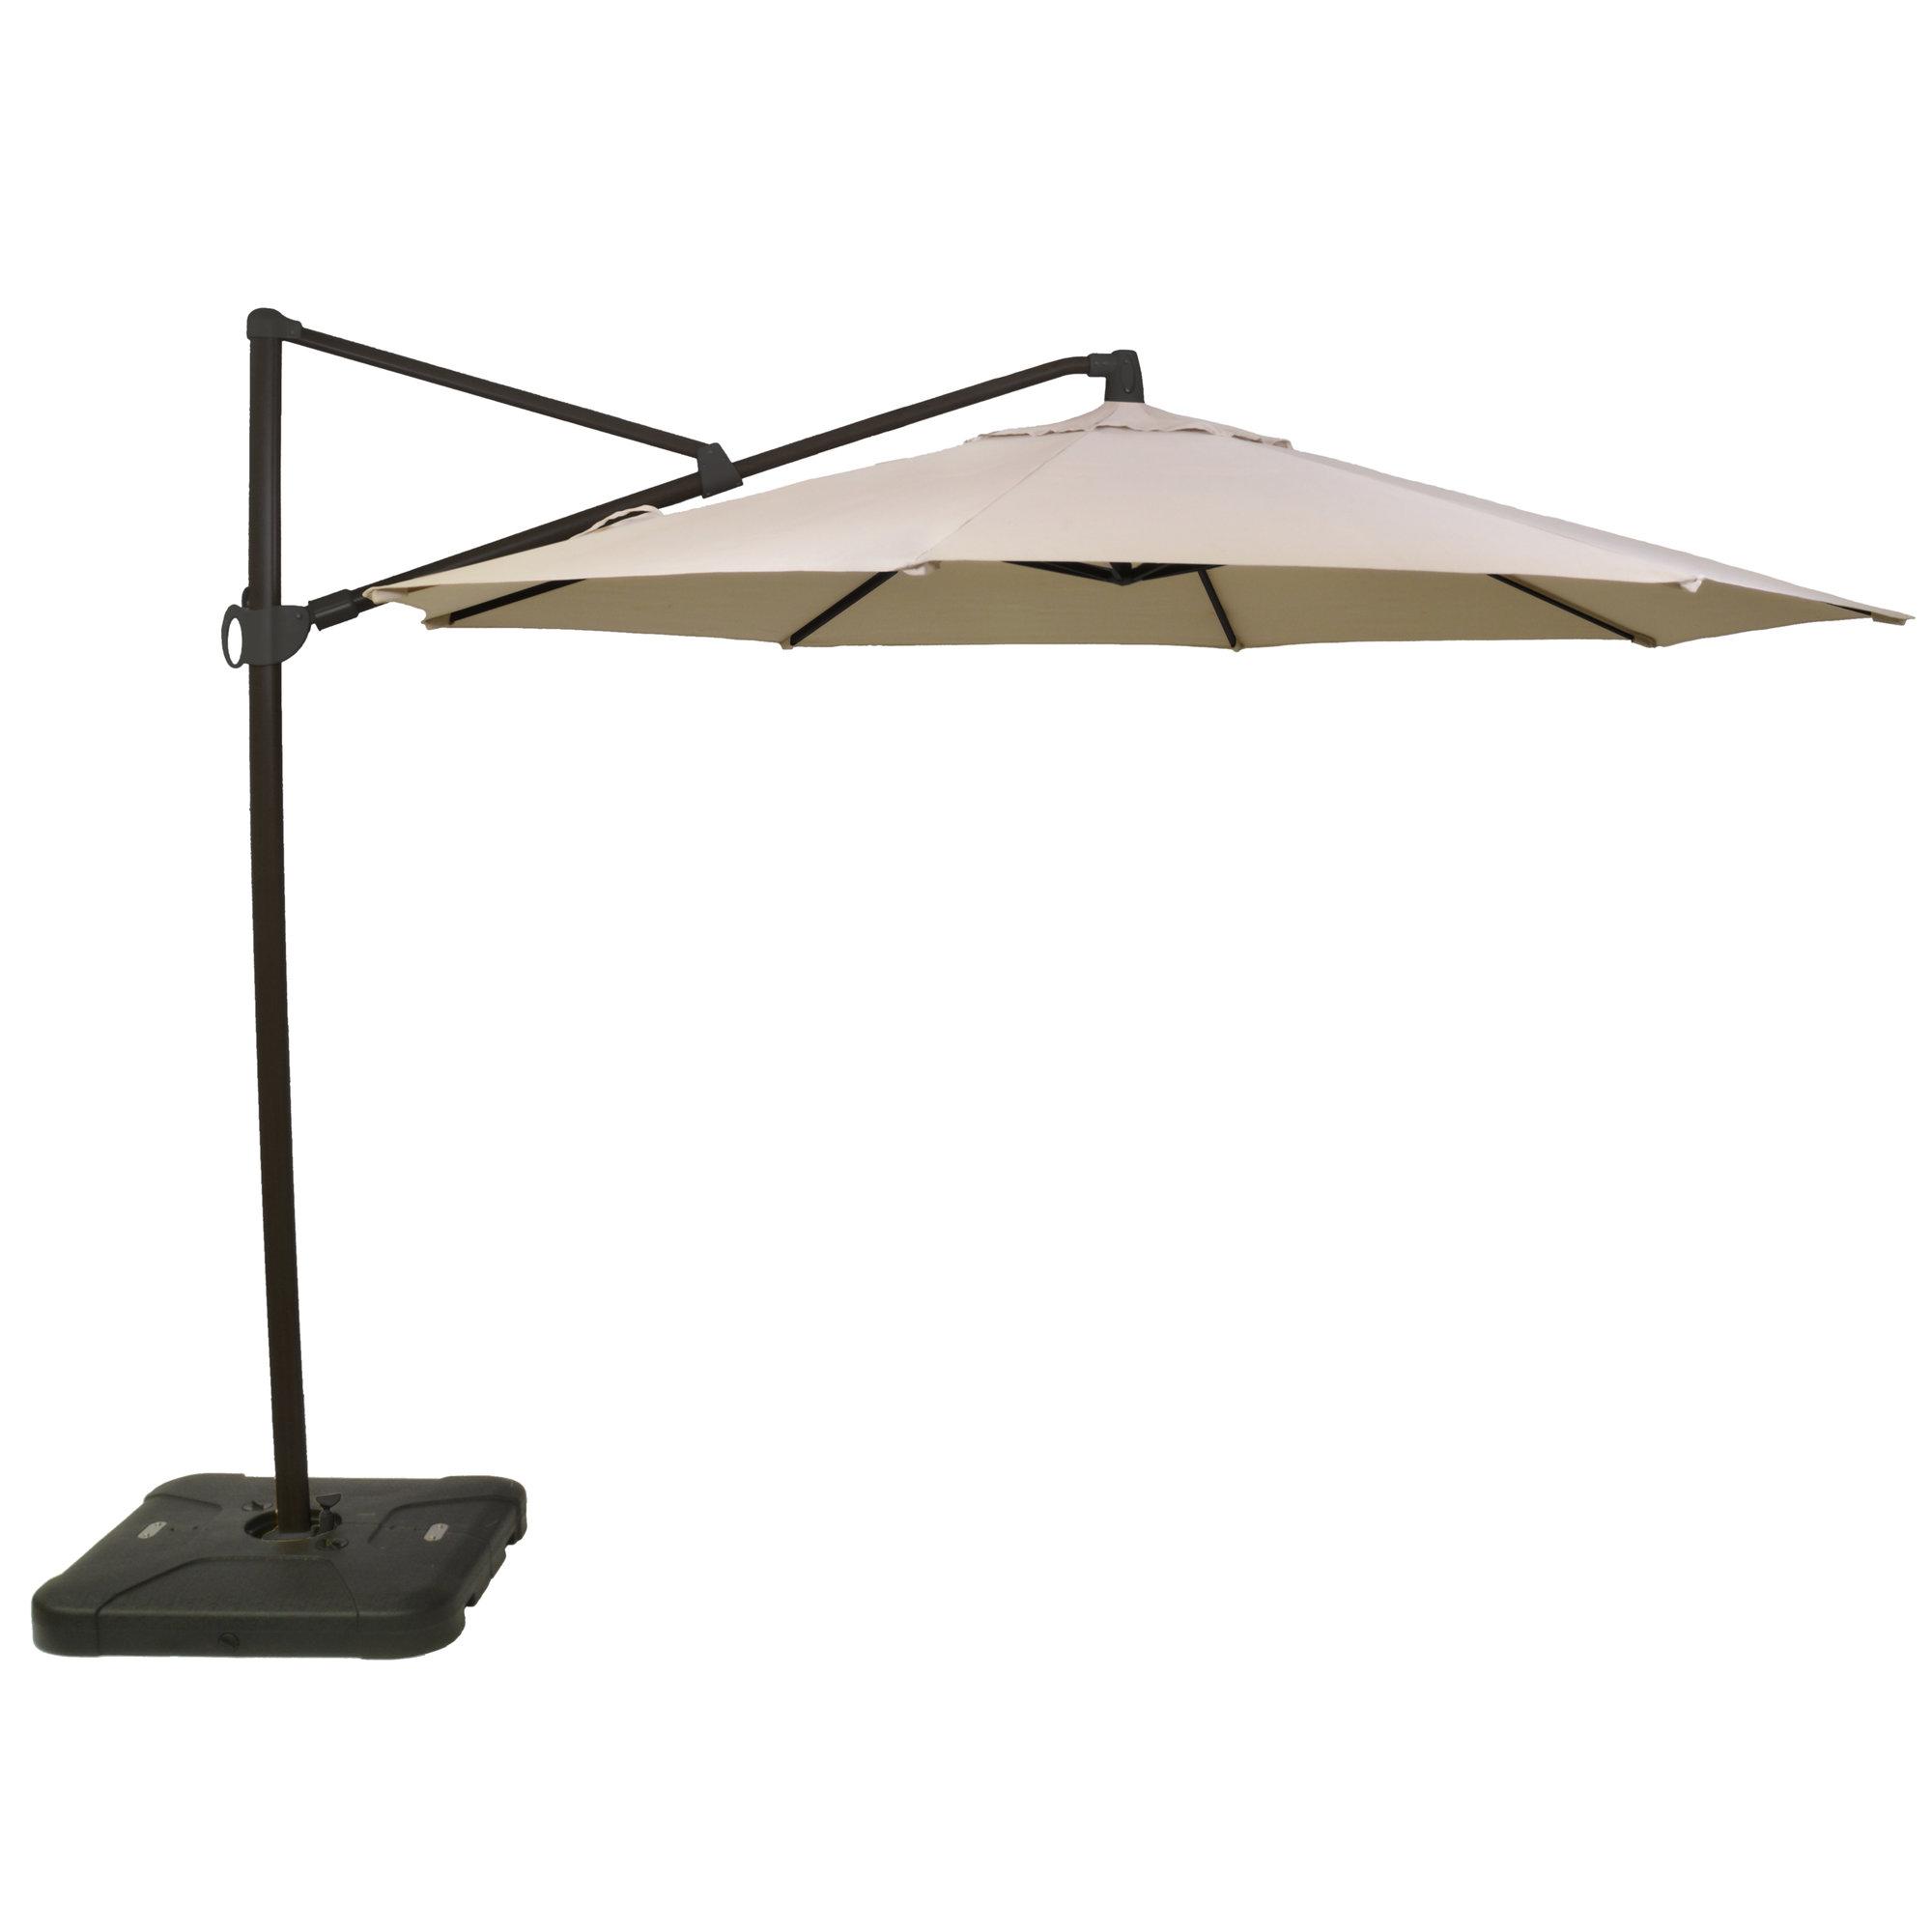 Most Recent Kedzie Outdoor Cantilever Umbrellas With Regard To Details About Alcott Hill Kedzie Outdoor 11' Cantilever Umbrella (View 2 of 20)